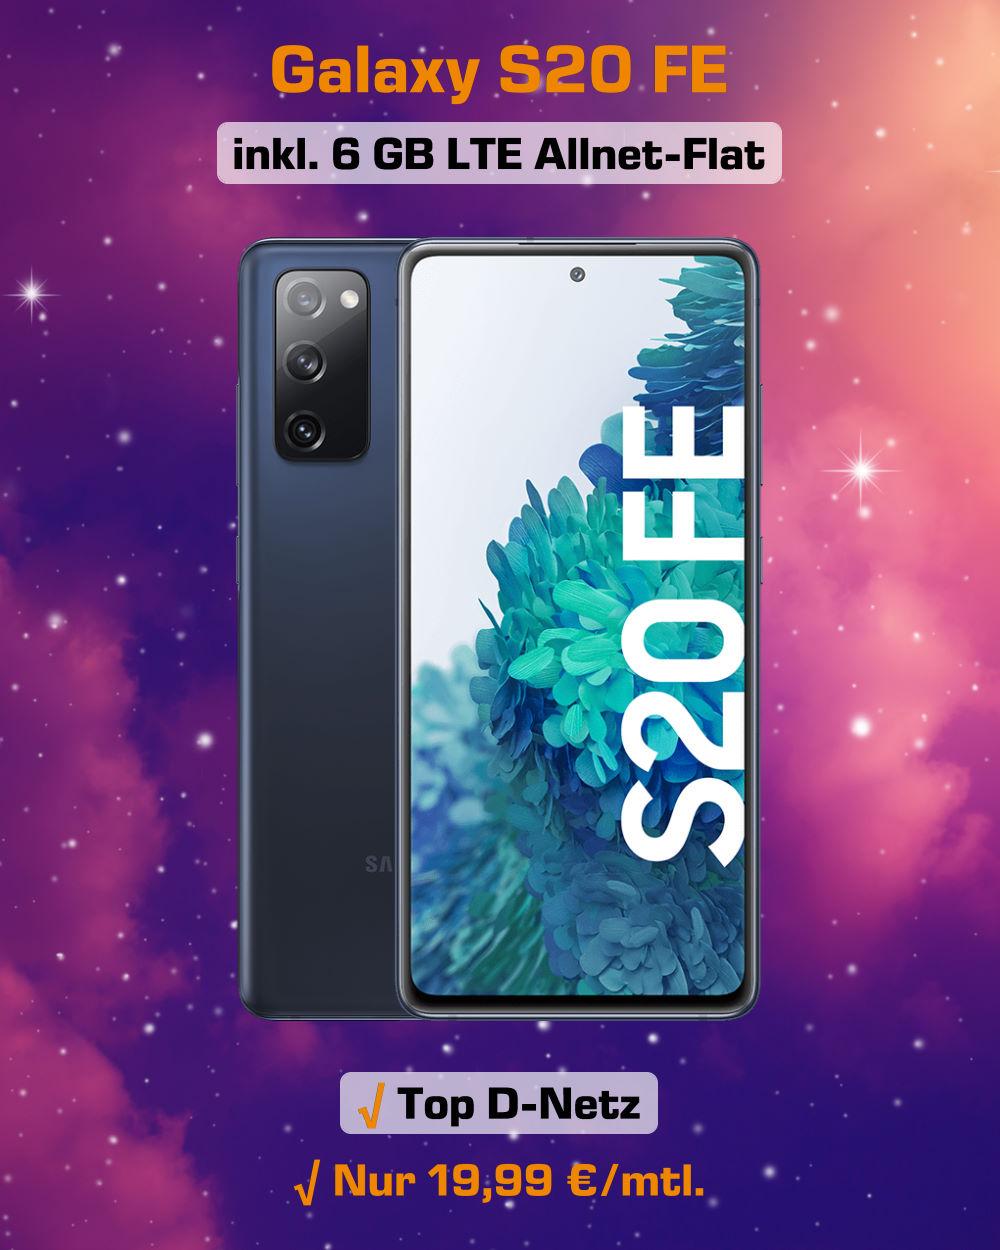 Galaxy S20 FE inkl. 6 GB LTE Allnet-Flat zum absoluten Bestpreis